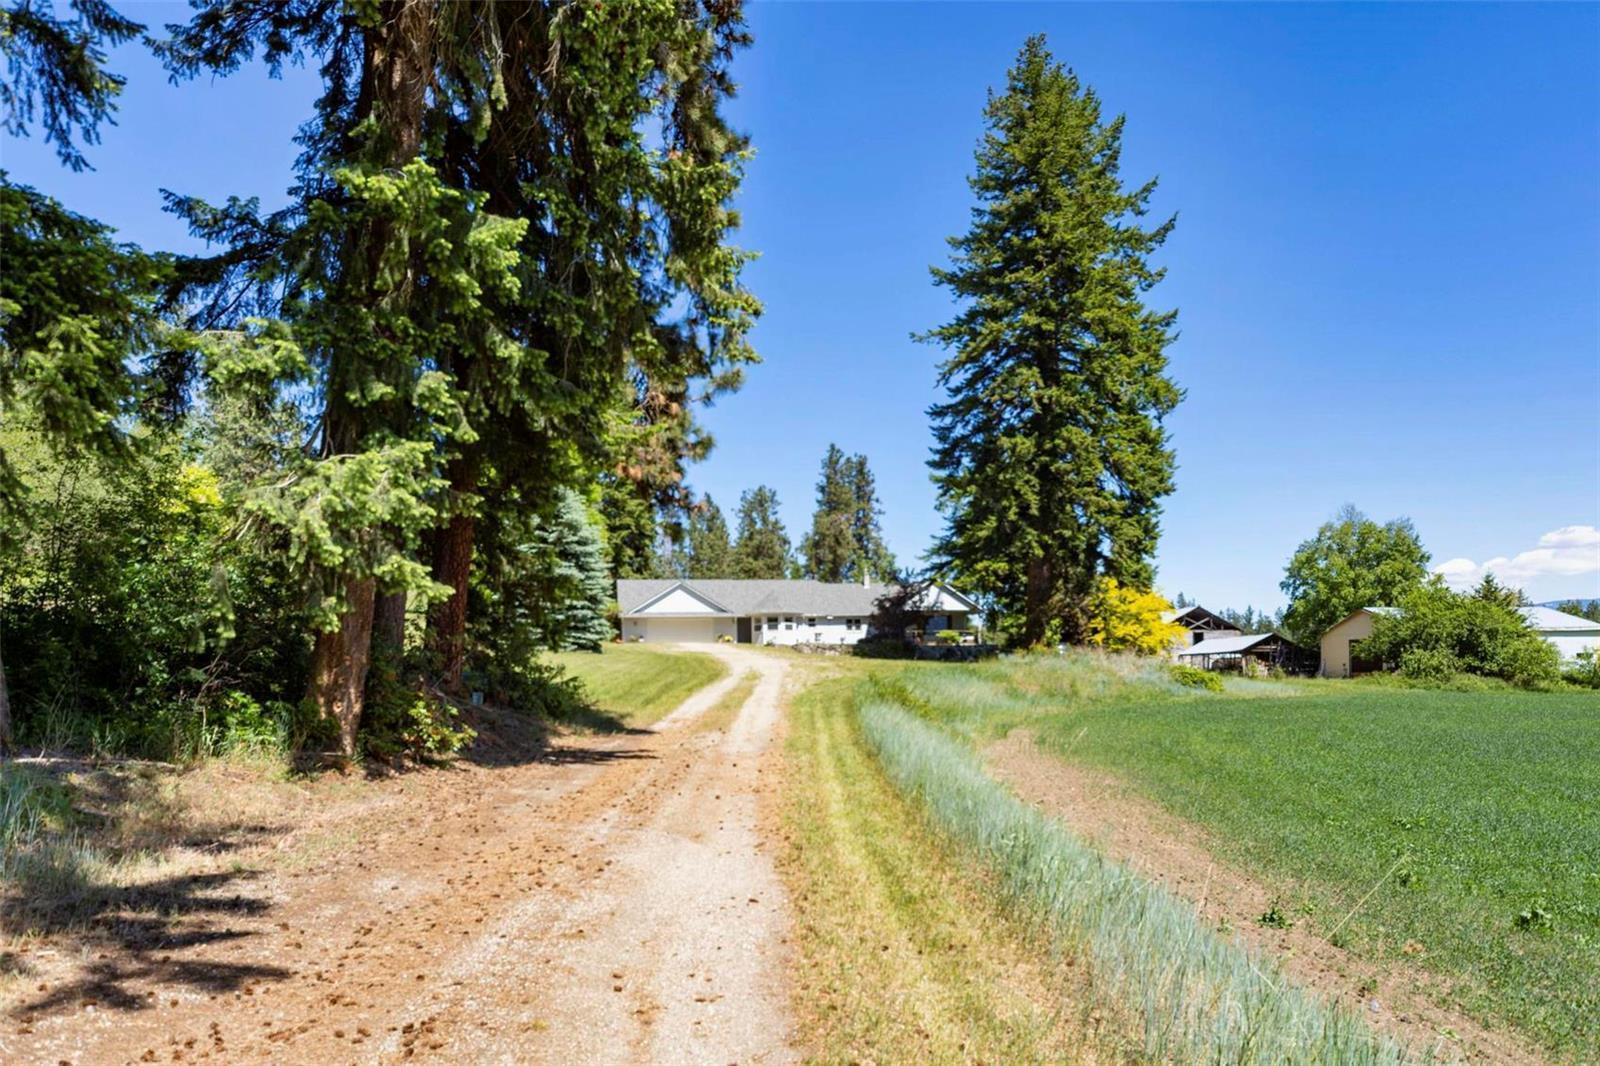 4602 Schubert Road,, Armstrong, British Columbia  V0E 1B4 - Photo 3 - 10232683